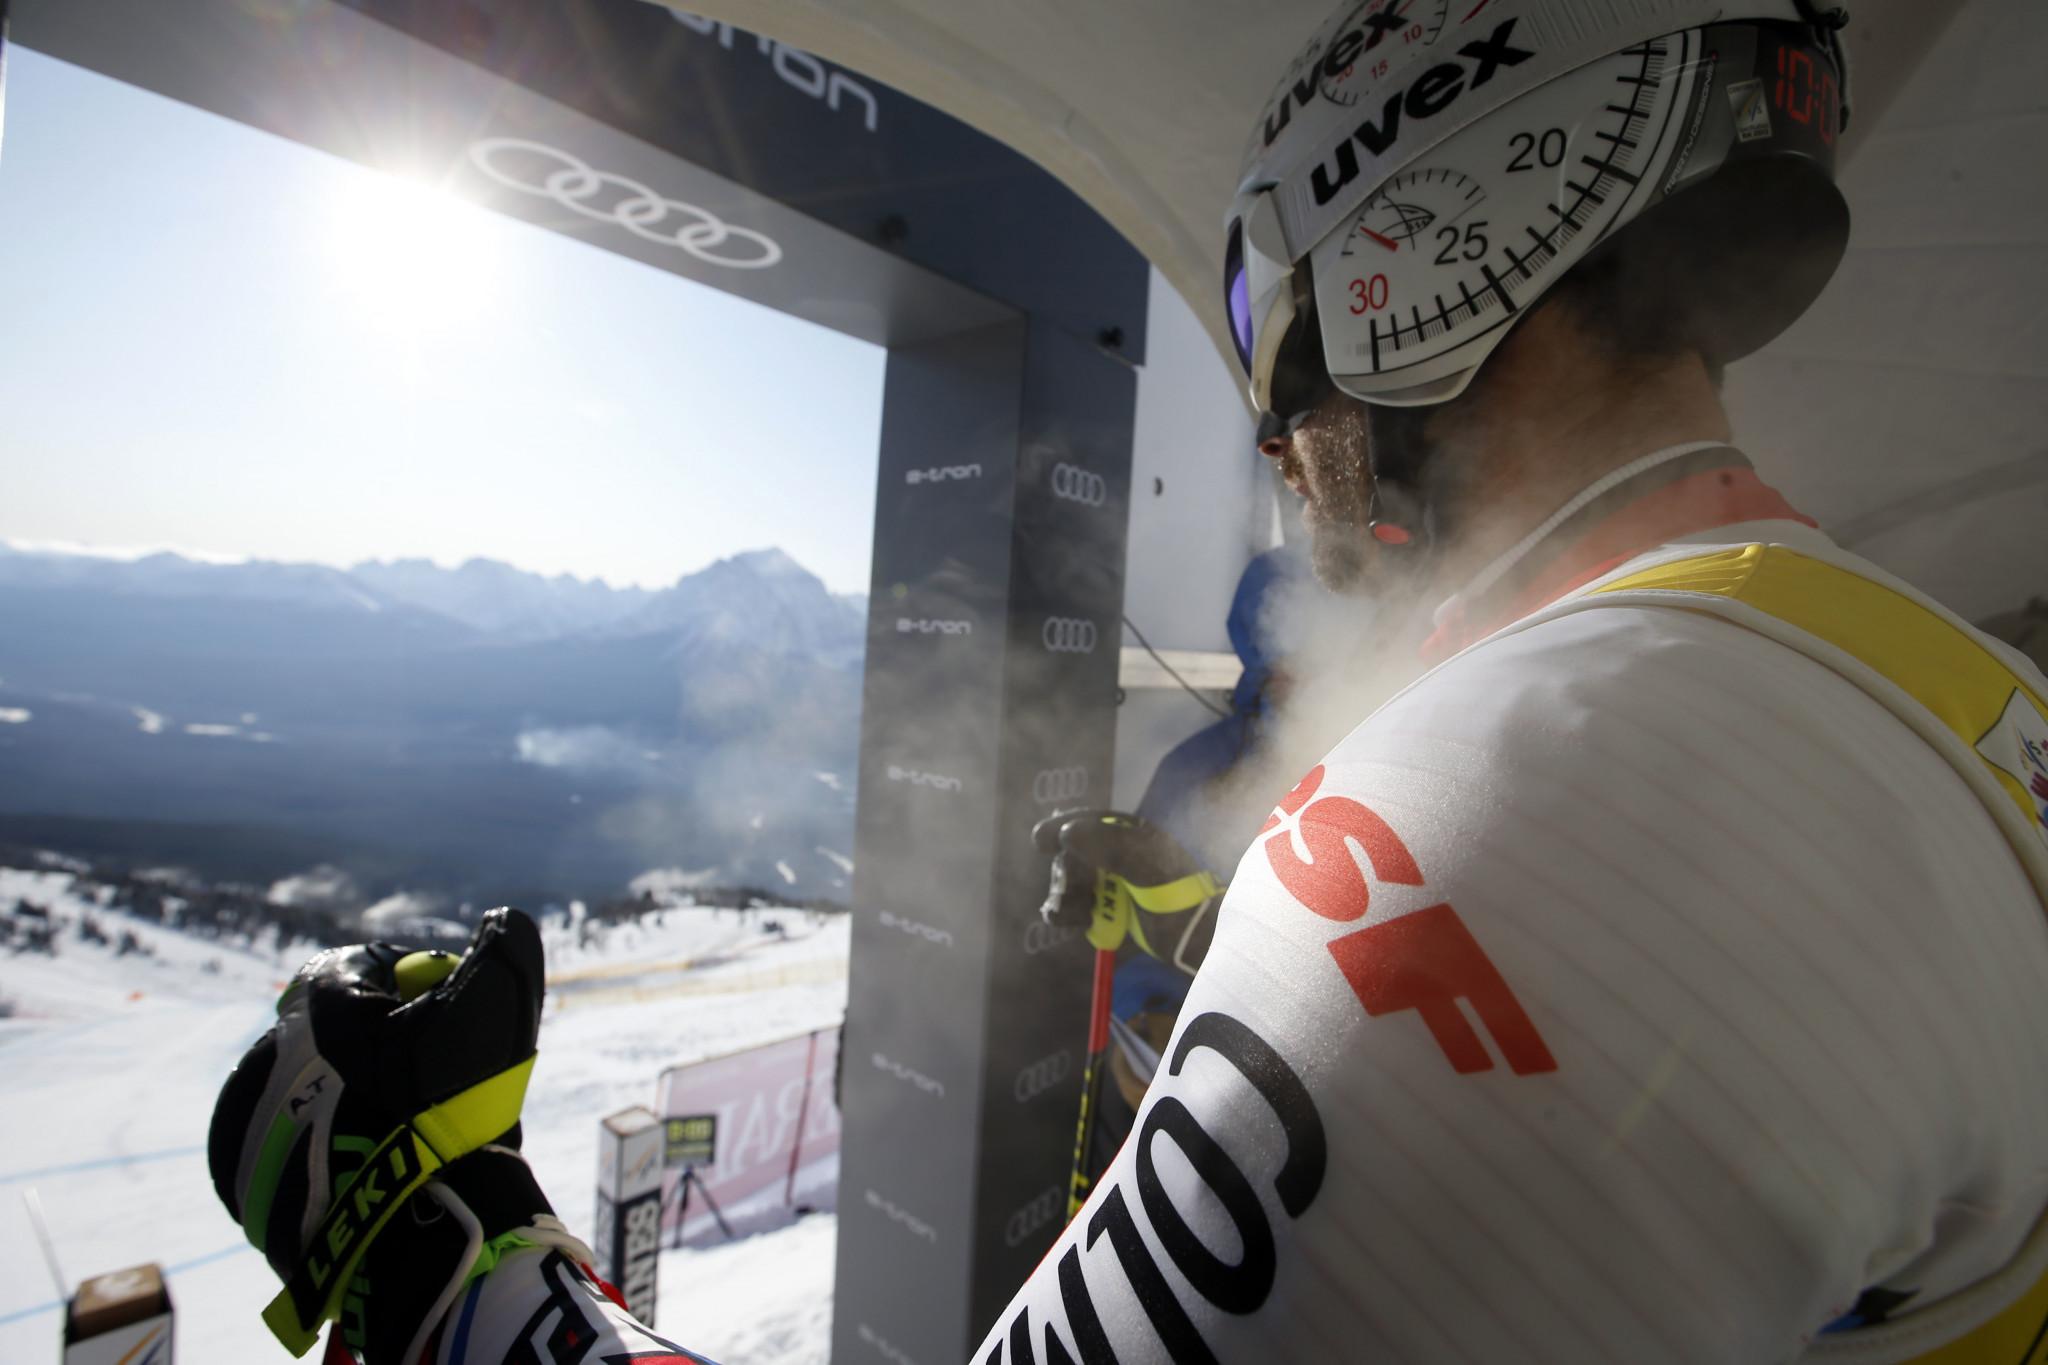 FIS Alpine Ski World Cup downhill season set to start at Lake Louise